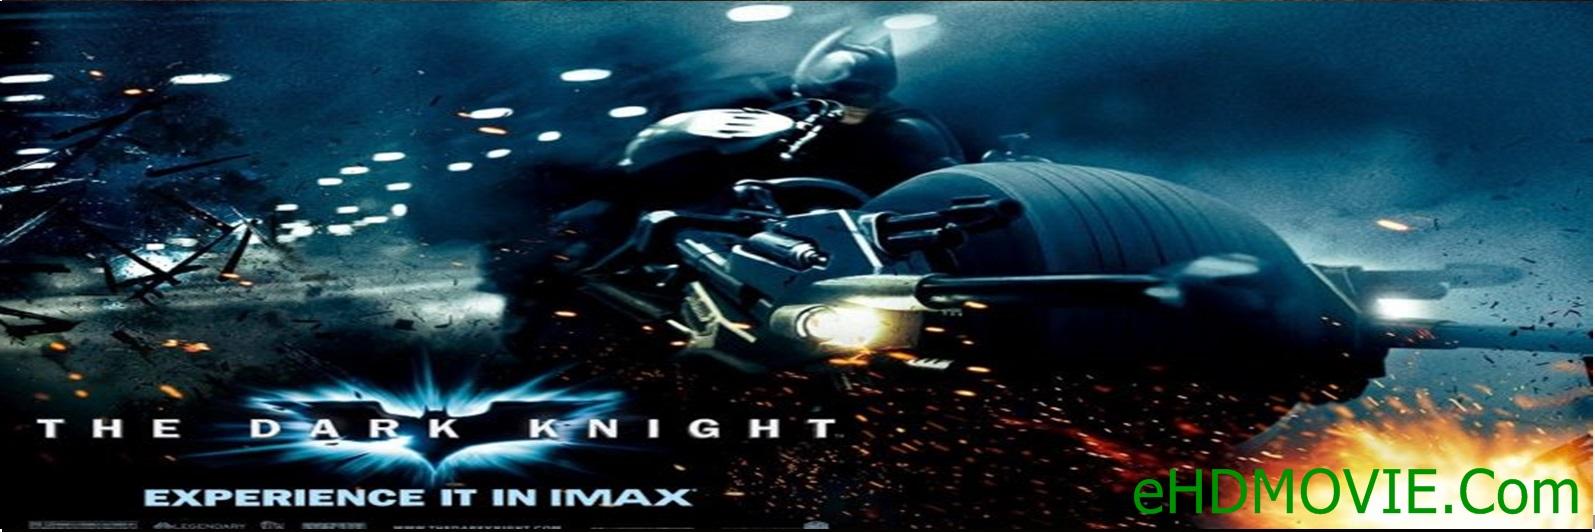 The Dark Knight 2008 Full Movie Dual Audio [Hindi – English] 1080p - 720p - 480p ORG BRRip 400MB - 1.2GB - 3GB ESubs Free Download